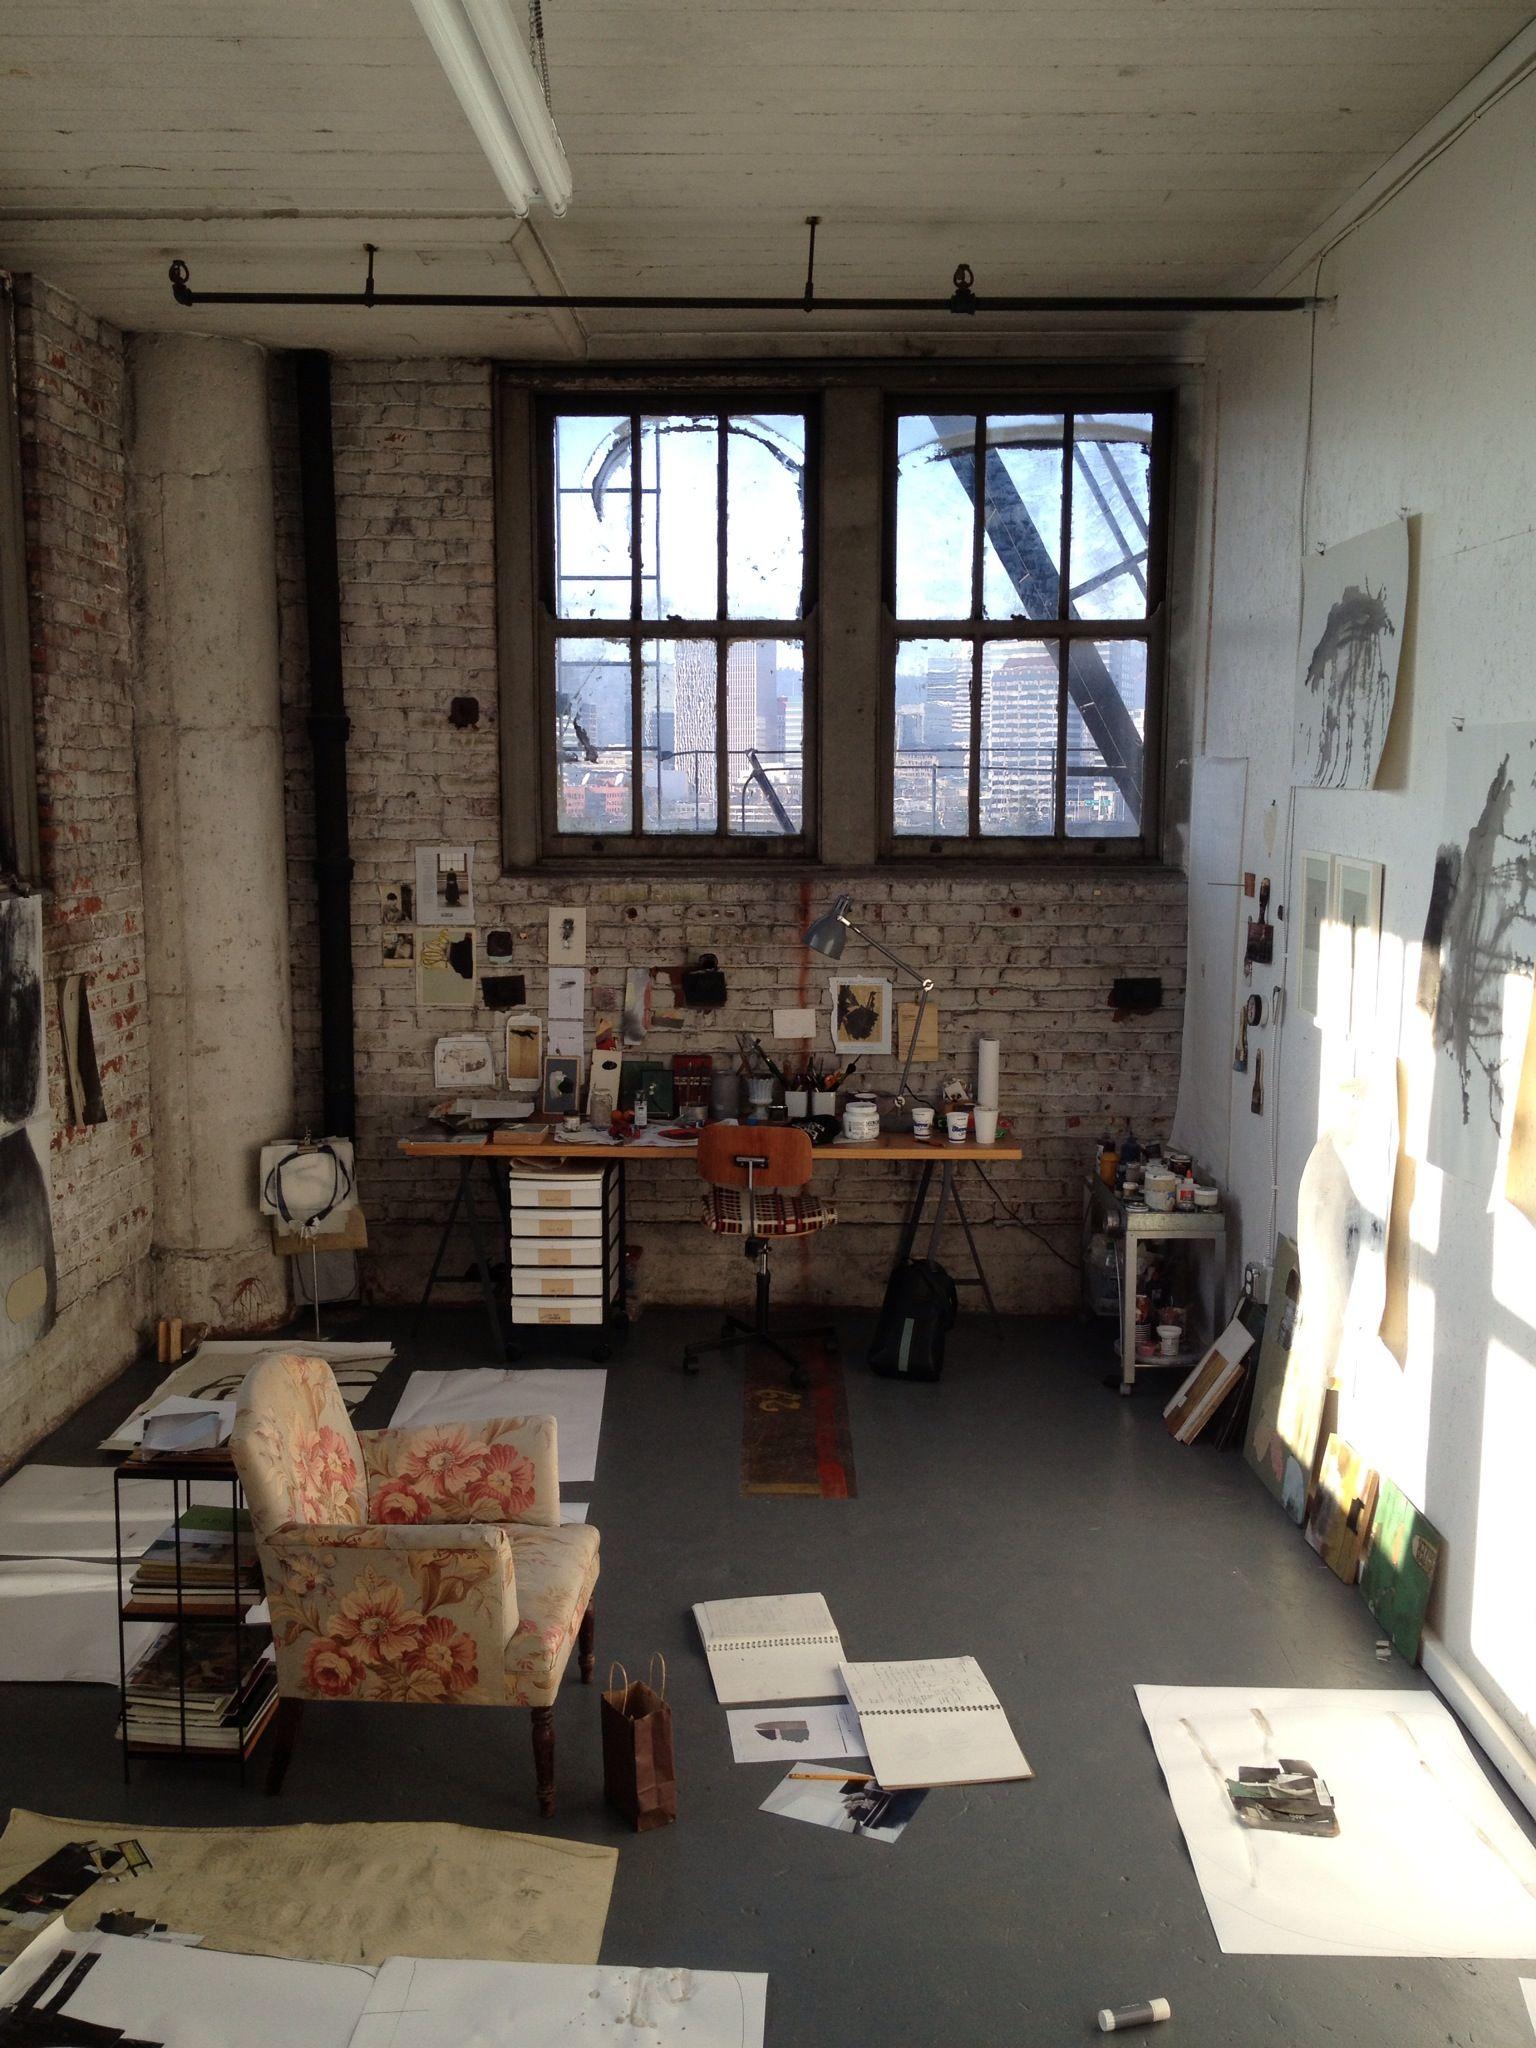 MaryAnn Puls' studio space